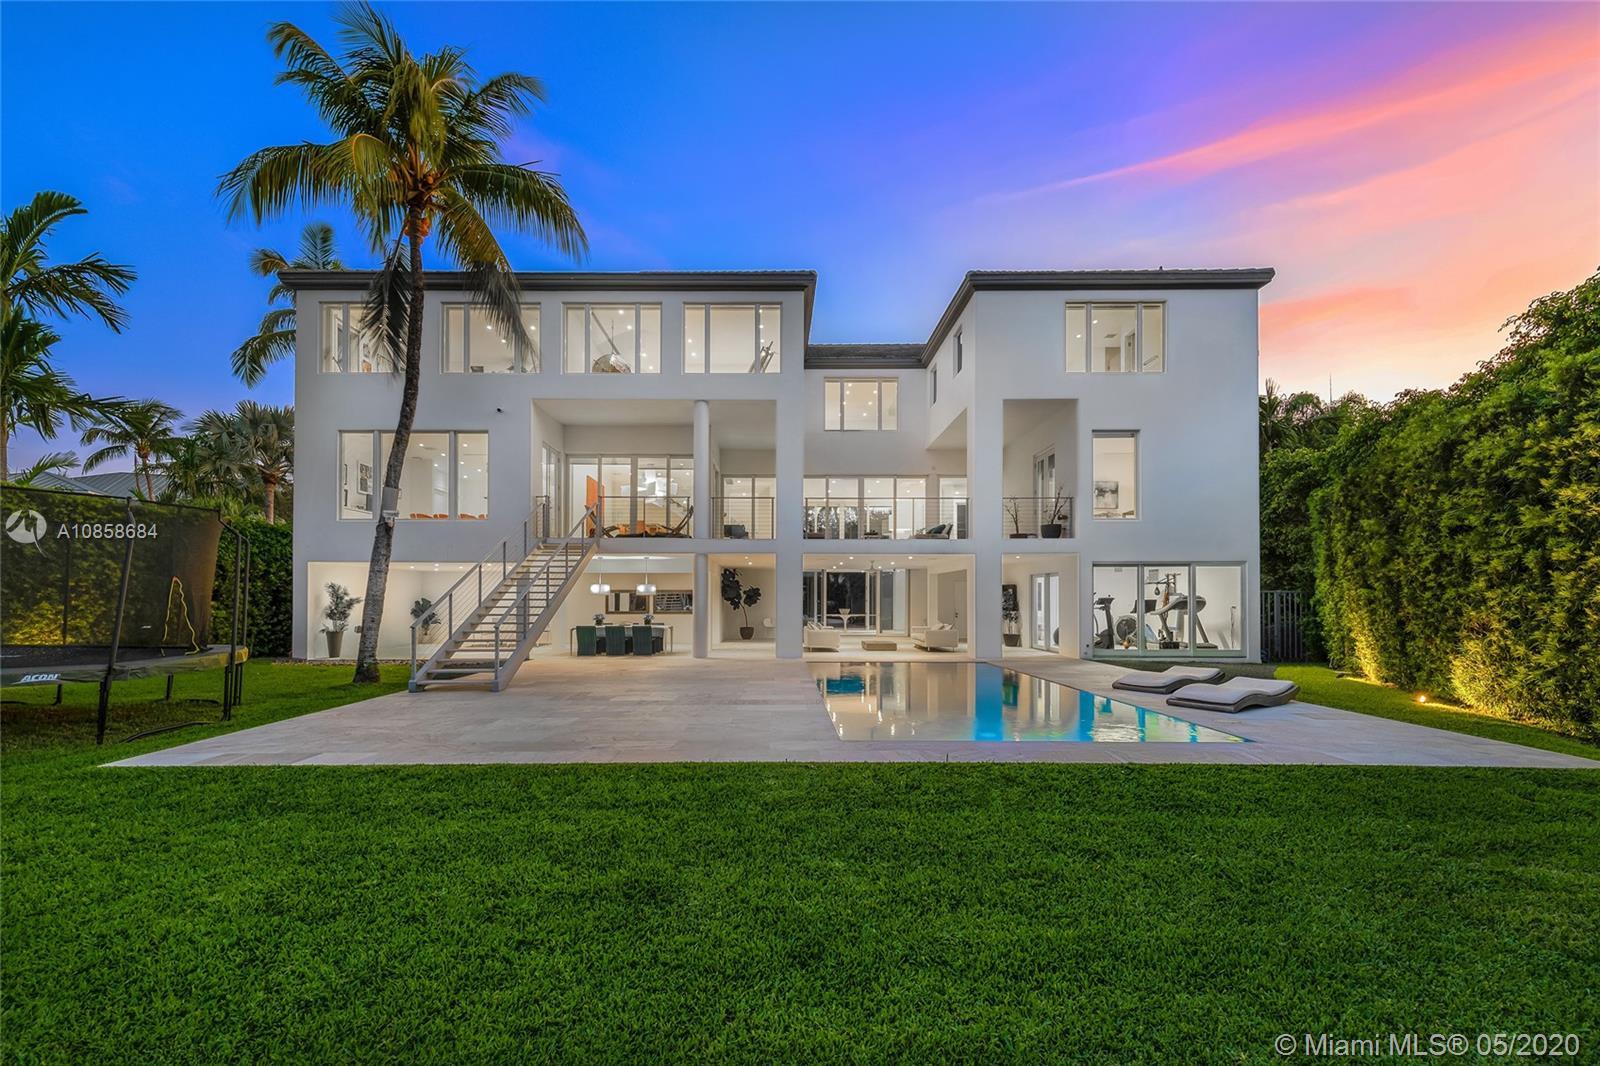 481 S Mashta Dr Luxury Real Estate